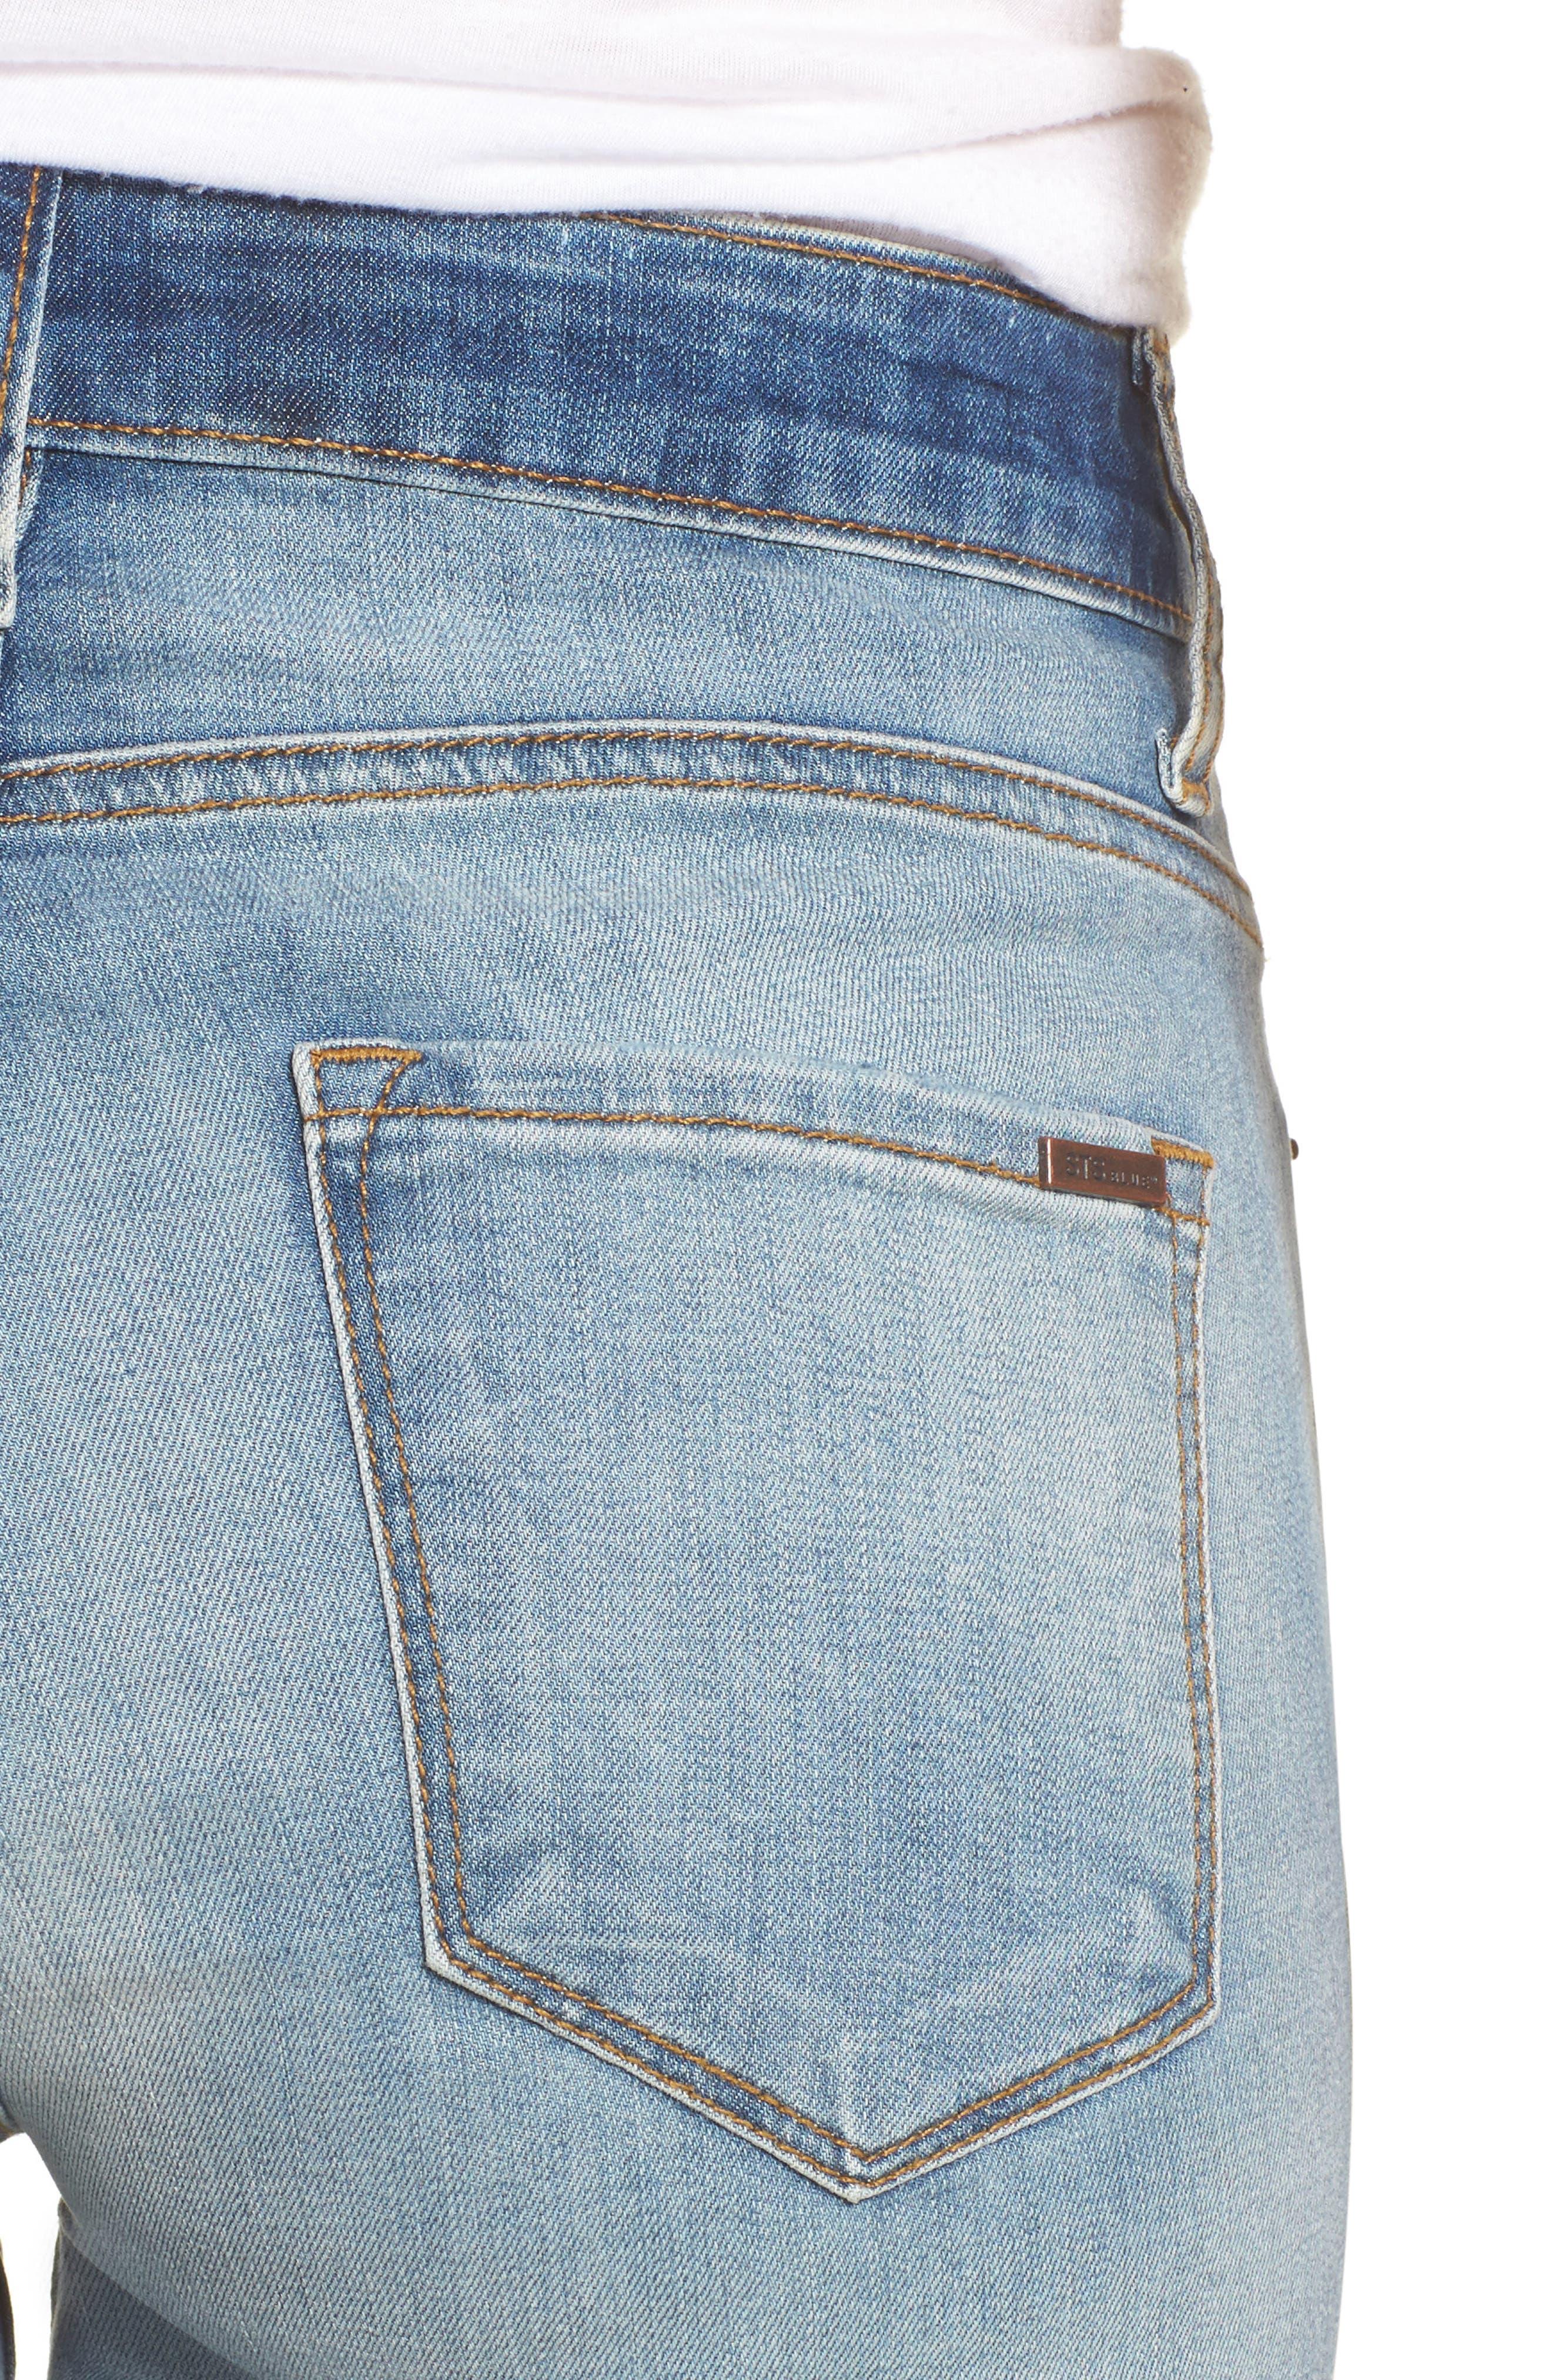 Ellie Ripped High Waist Skinny Jeans,                             Alternate thumbnail 4, color,                             400